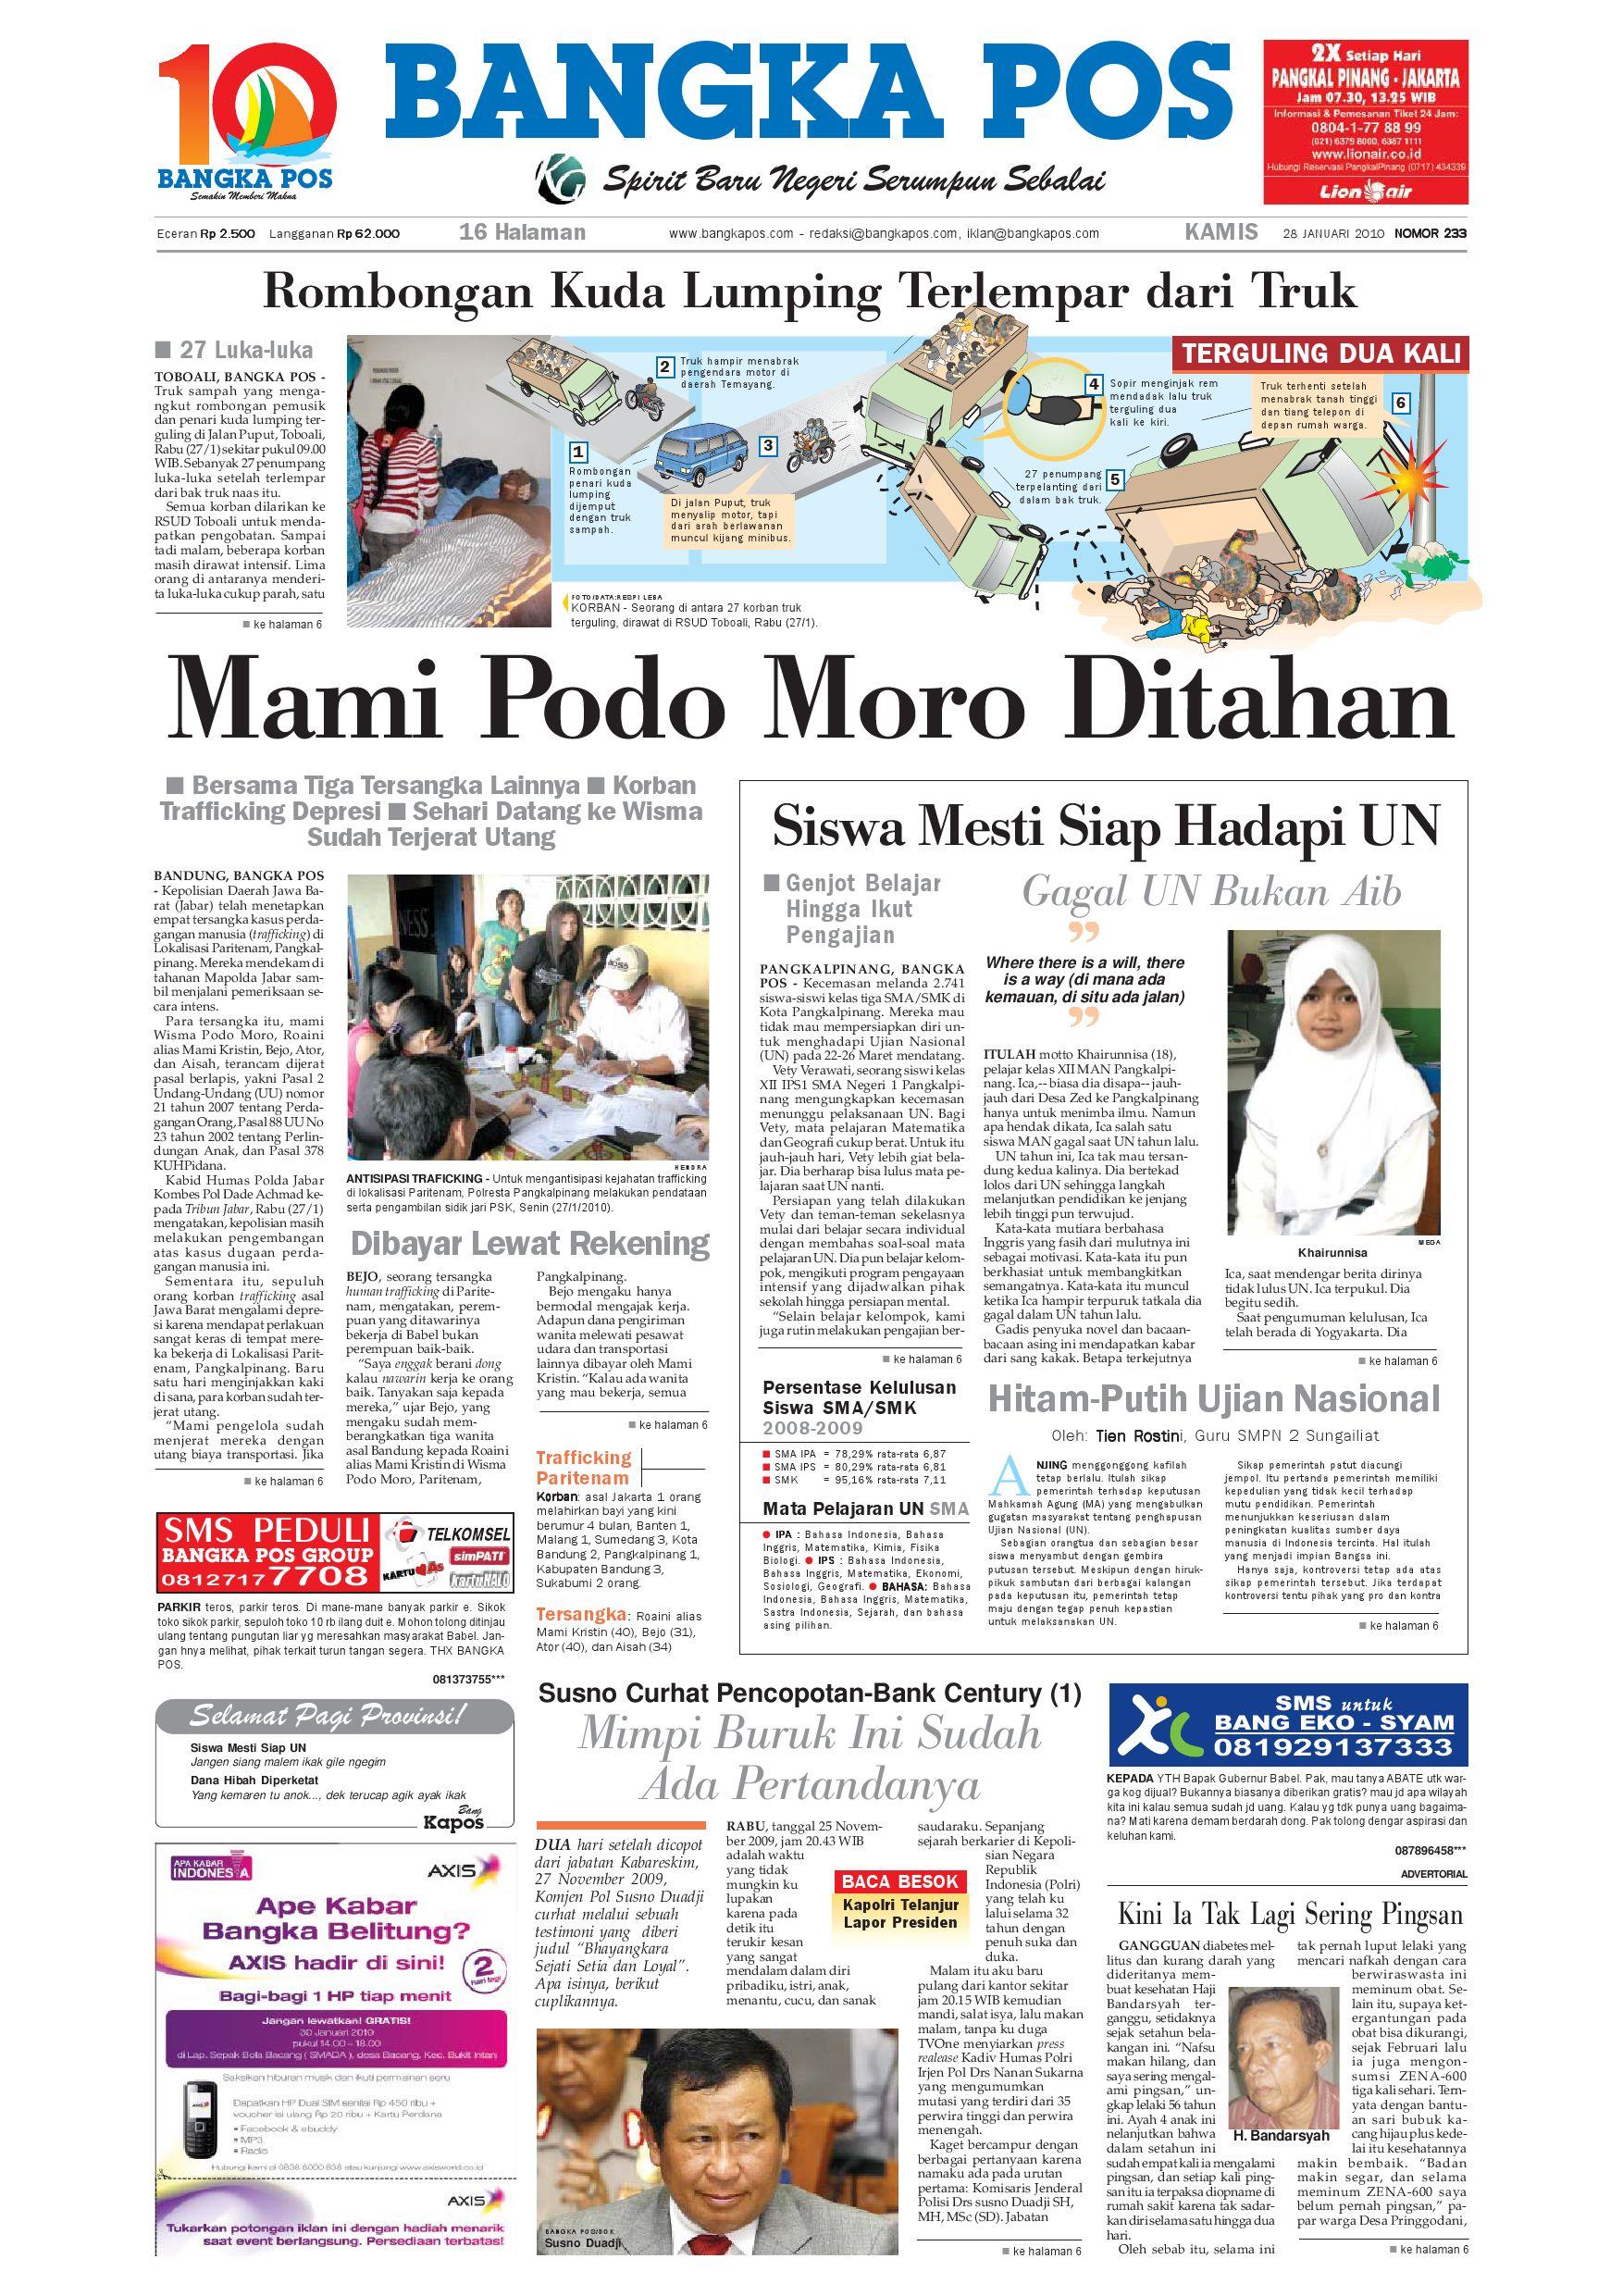 Harian Pagi Bangka Pos Edisi 28 Januari 2010 By Issuu Produk Ukm Bumn Tas Phiton Kembang Orchid